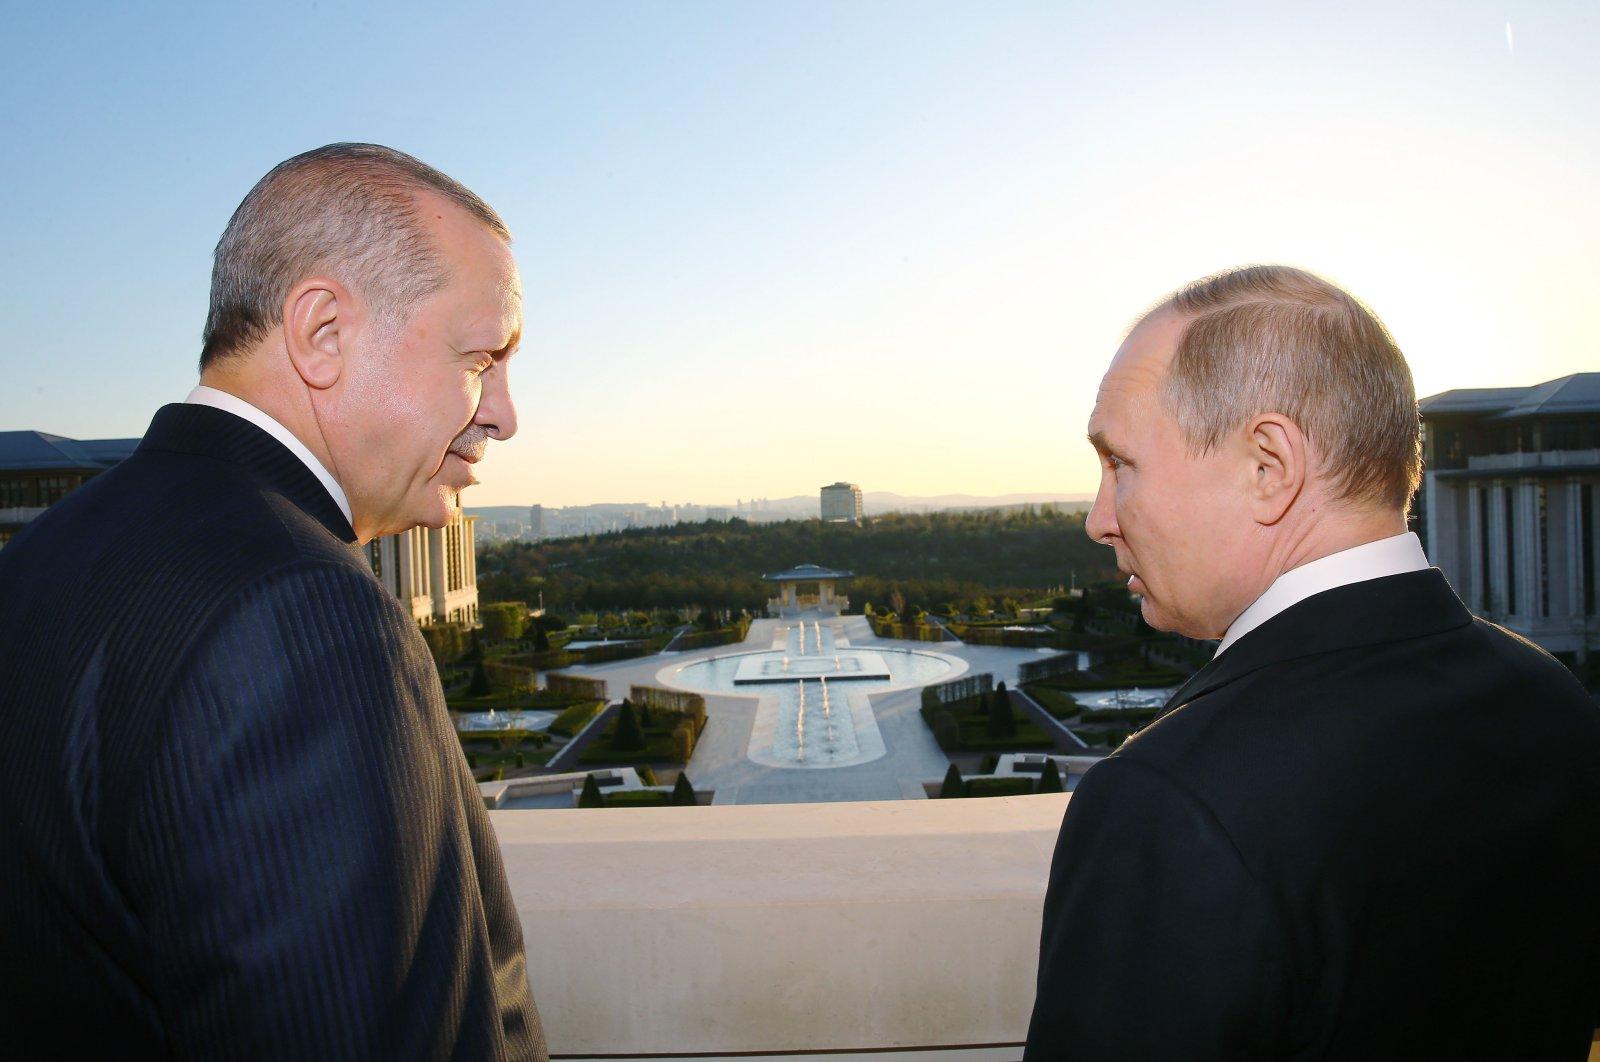 President Recep Tayyip Erdoğan welcomes his Russian counterpart Vladimir Putin at the Beştepe Presidential Complex during a visit in Ankara, on April 03, 2018. (Turkish Presidency via AA)